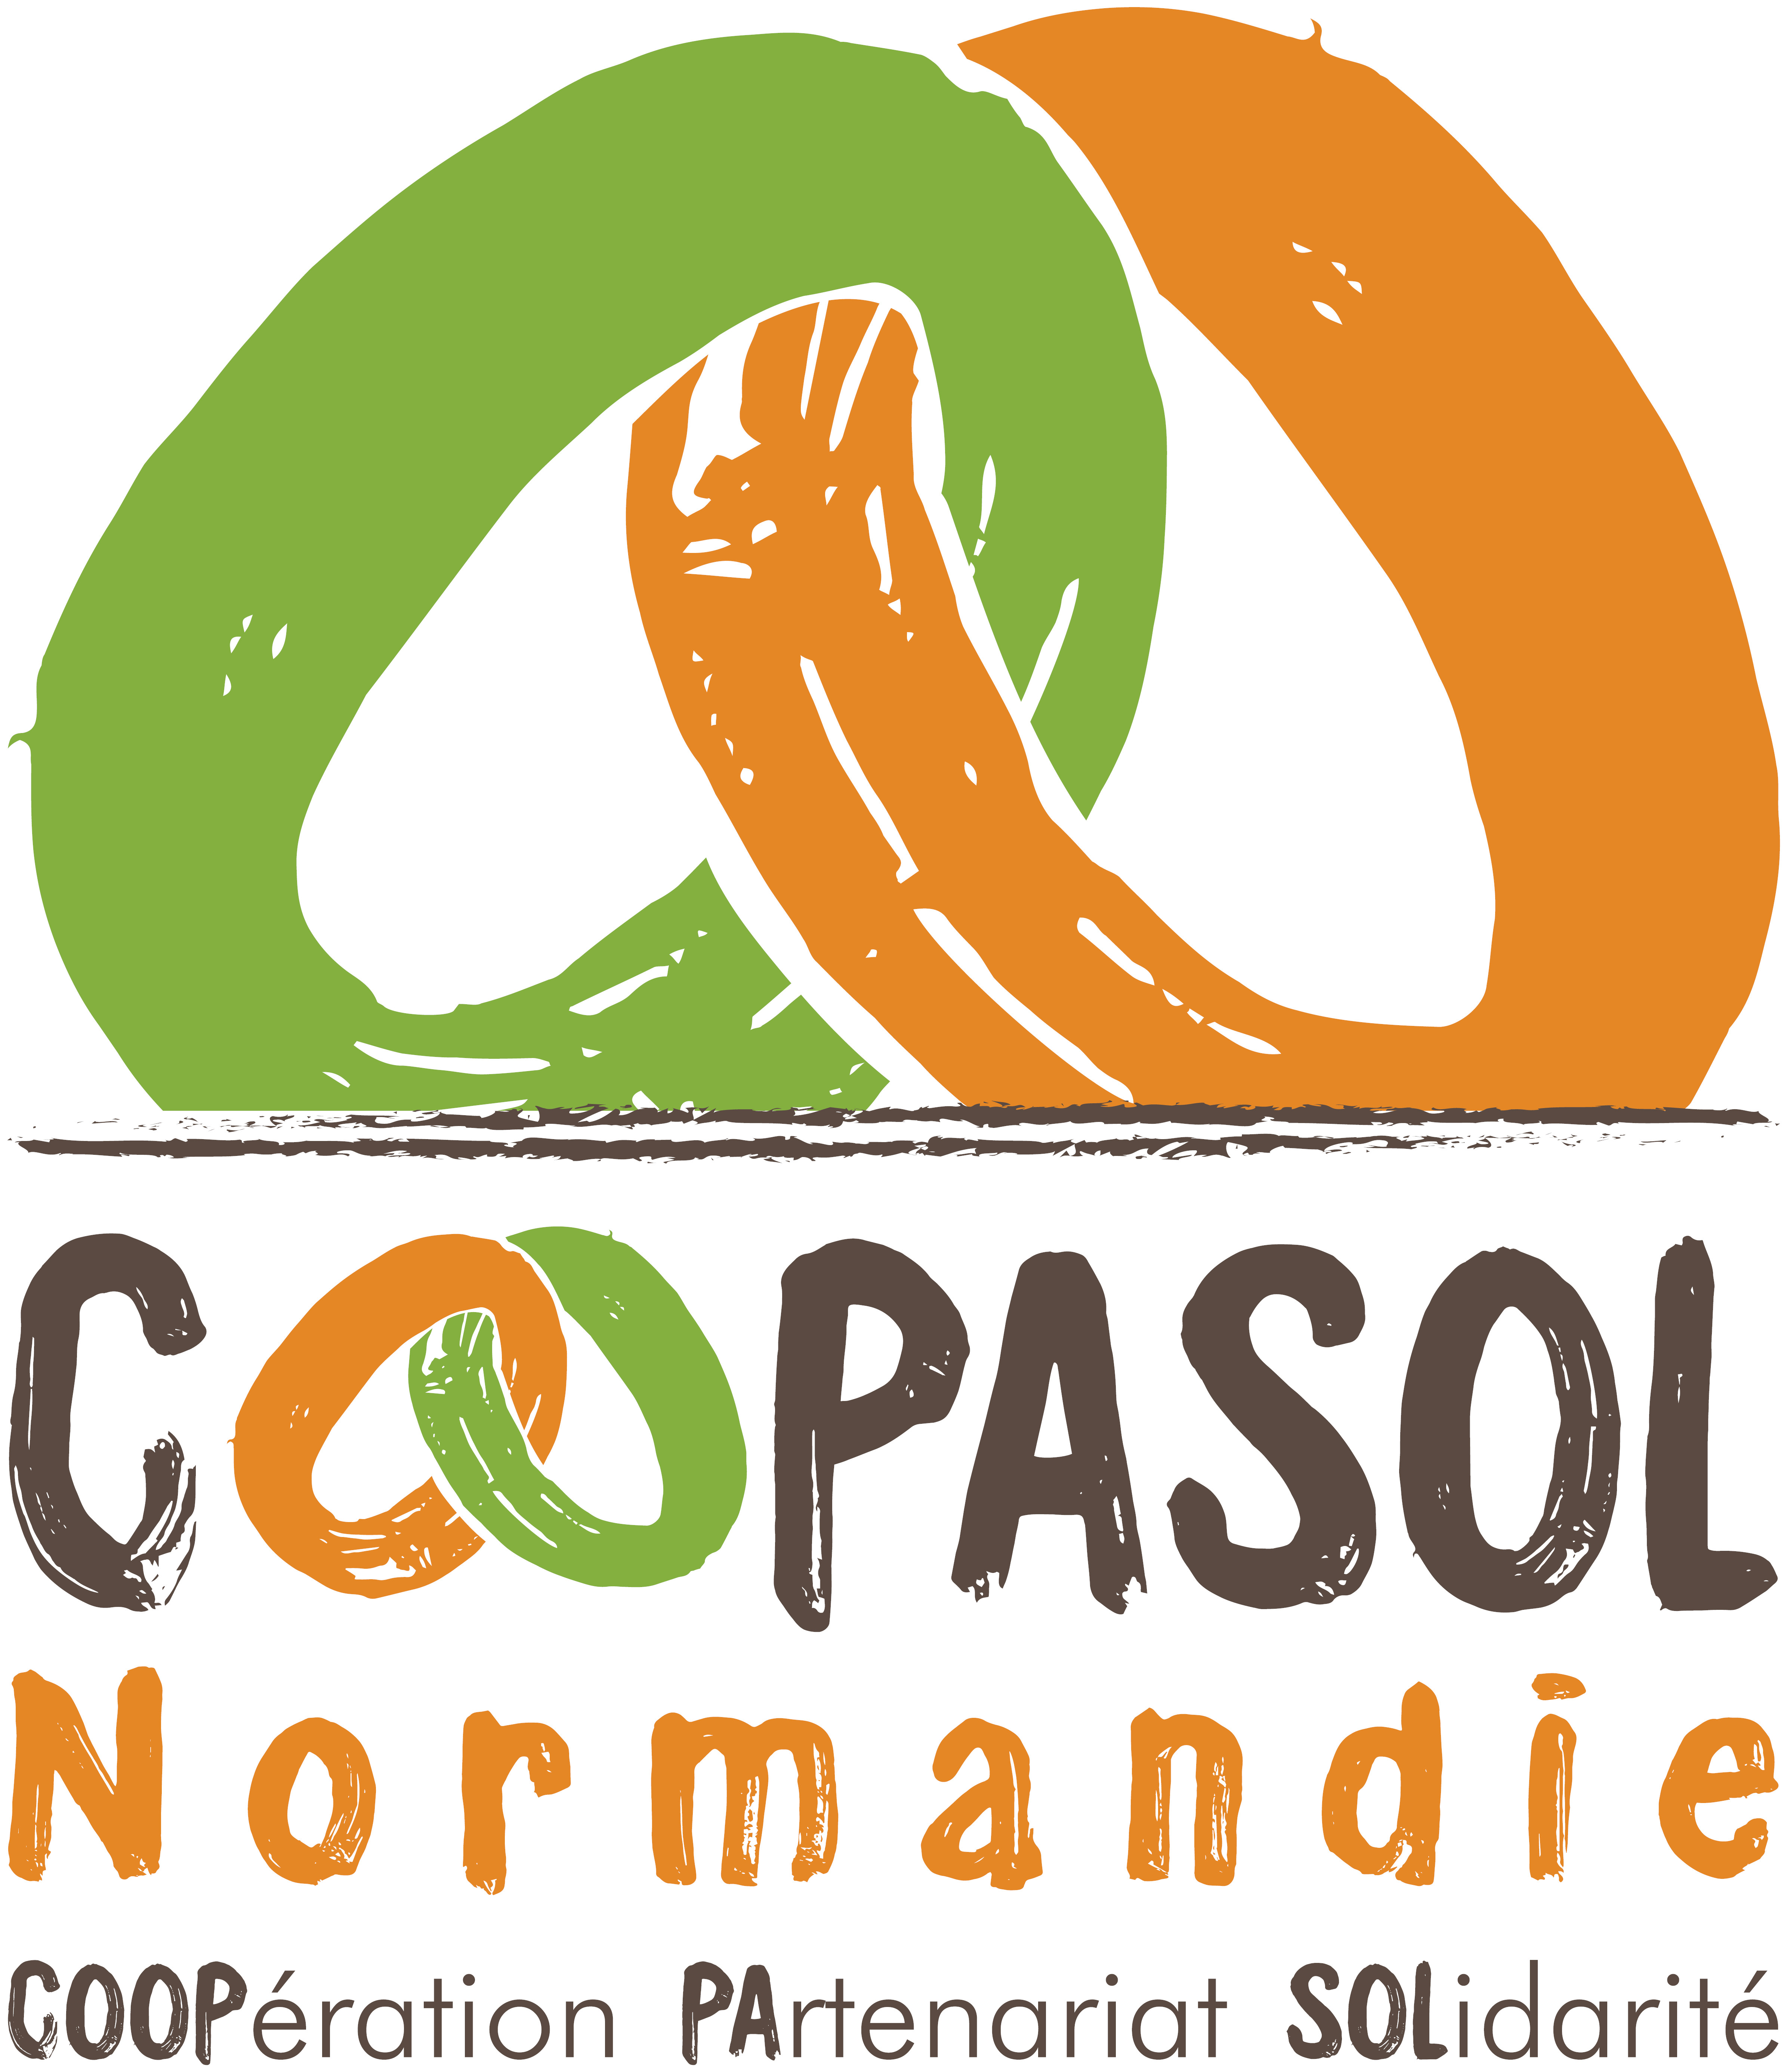 COOPASOL Normandie – COOpération PArtenariat SOLidarité